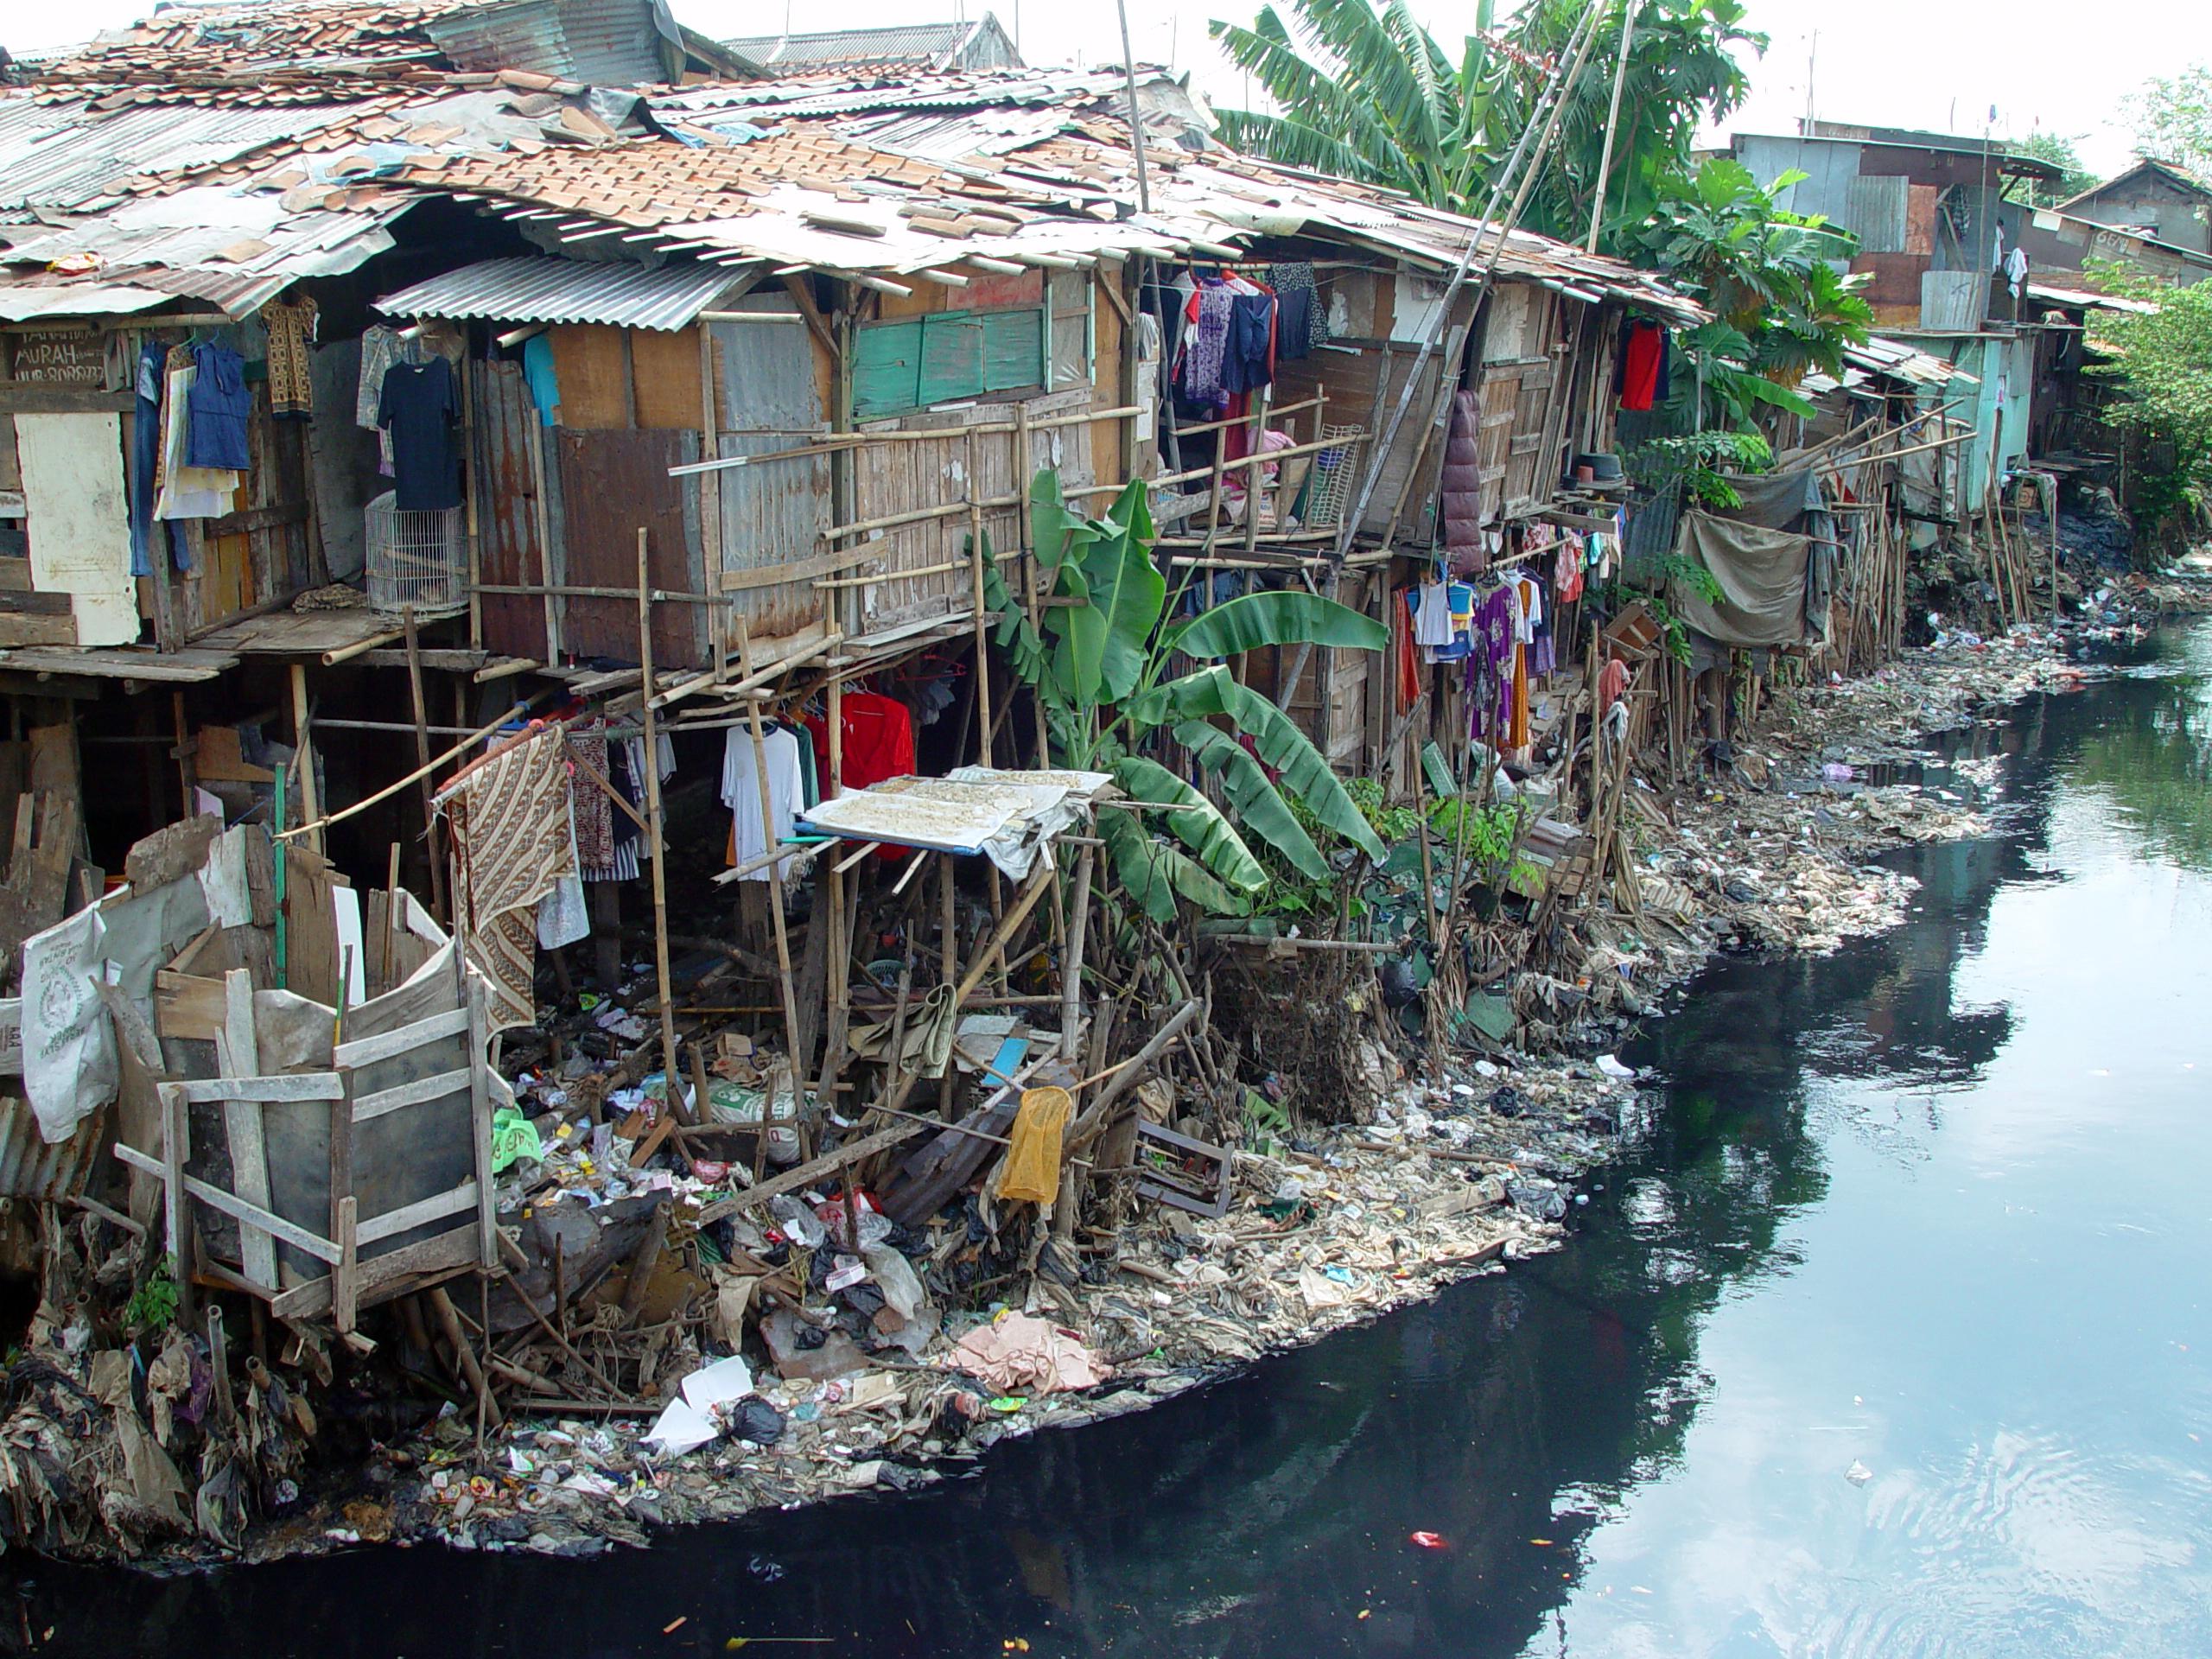 Extrem fattigdom